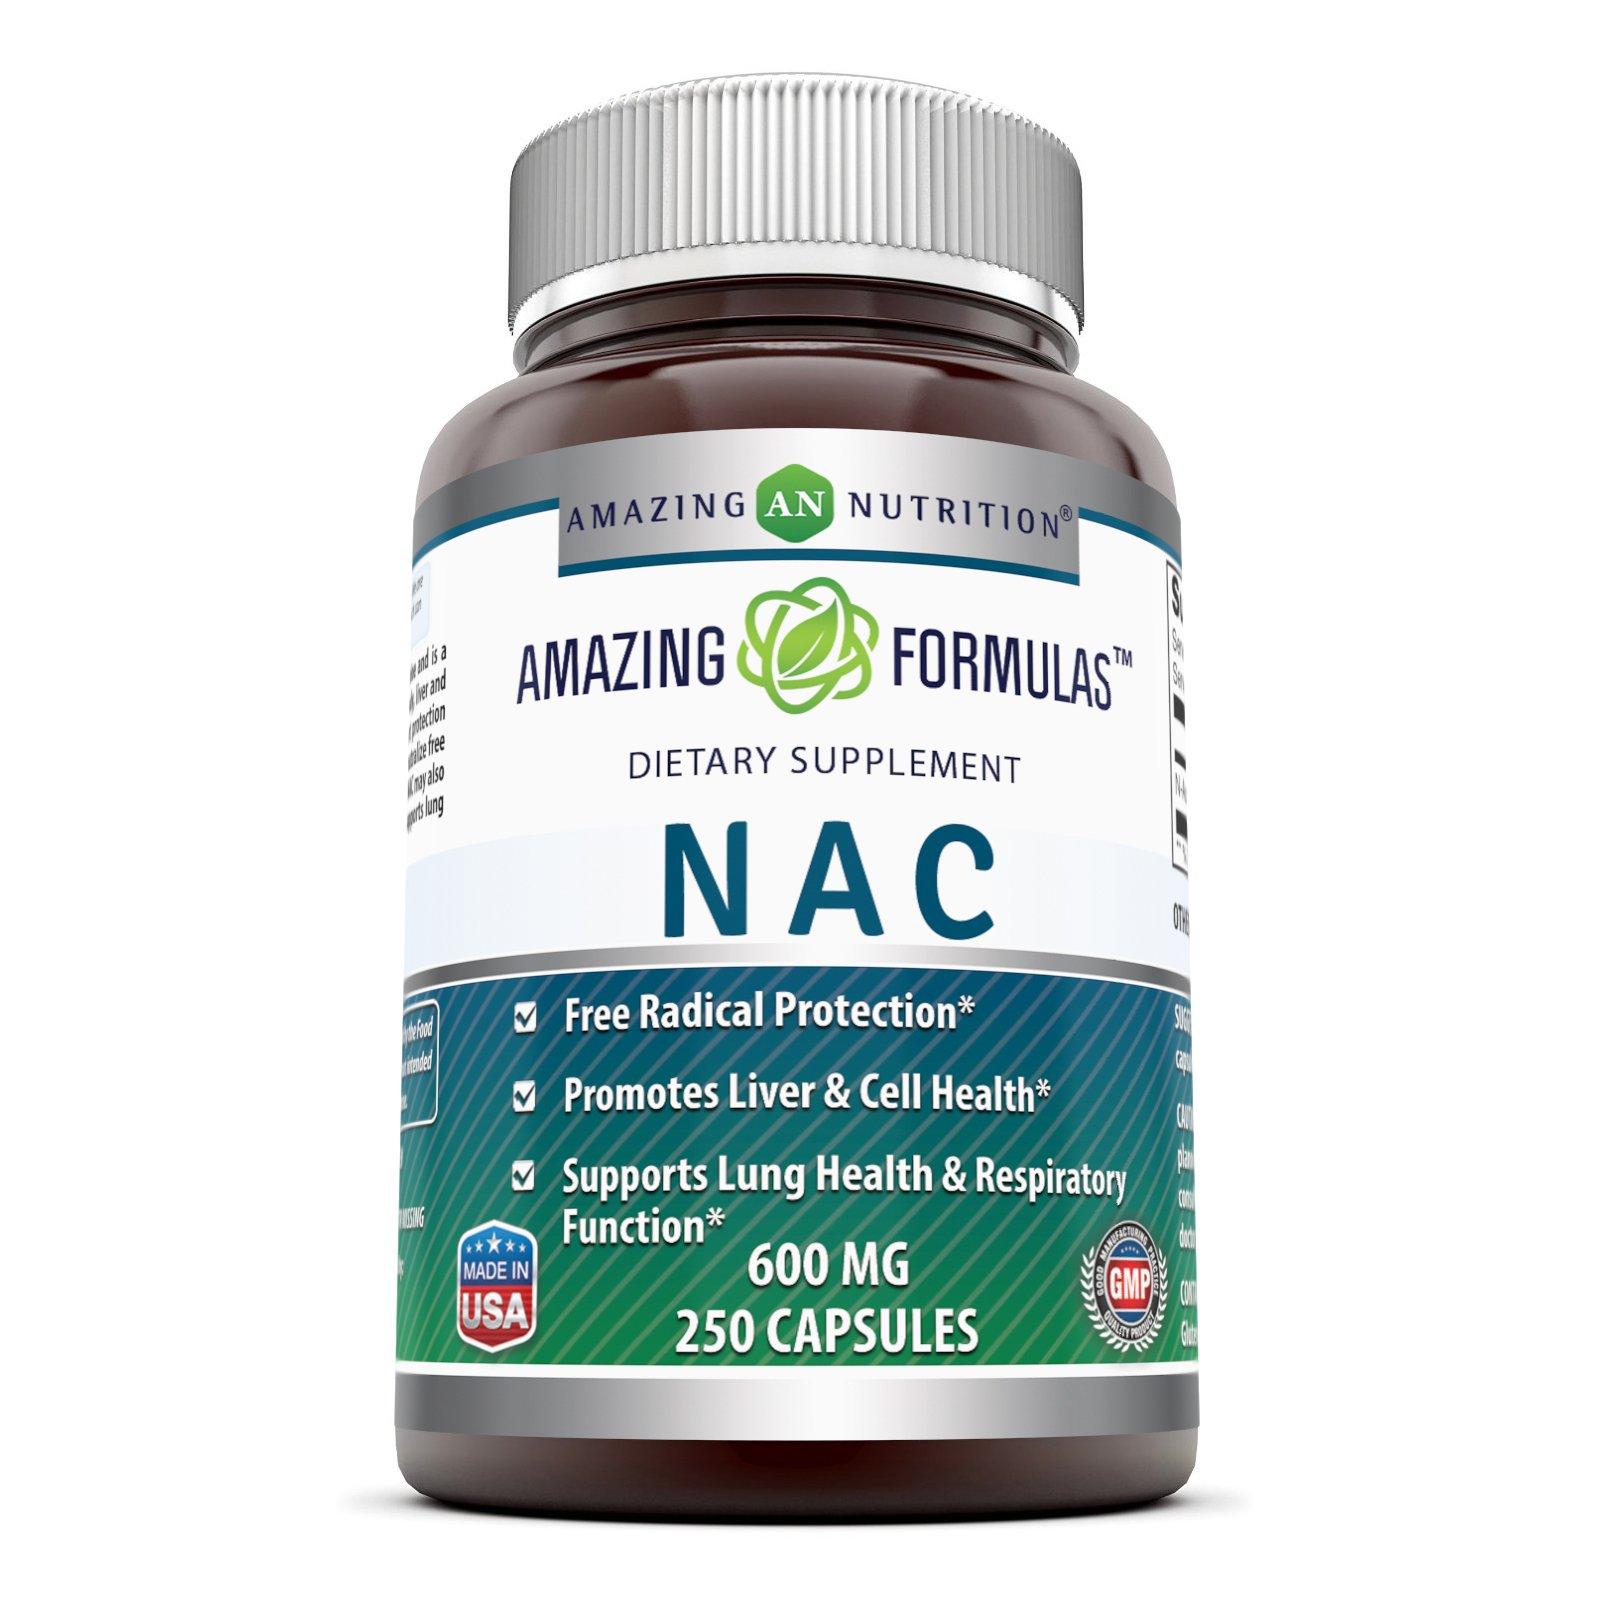 Amazing Formulas NAC 600 Mg 250 Capsules